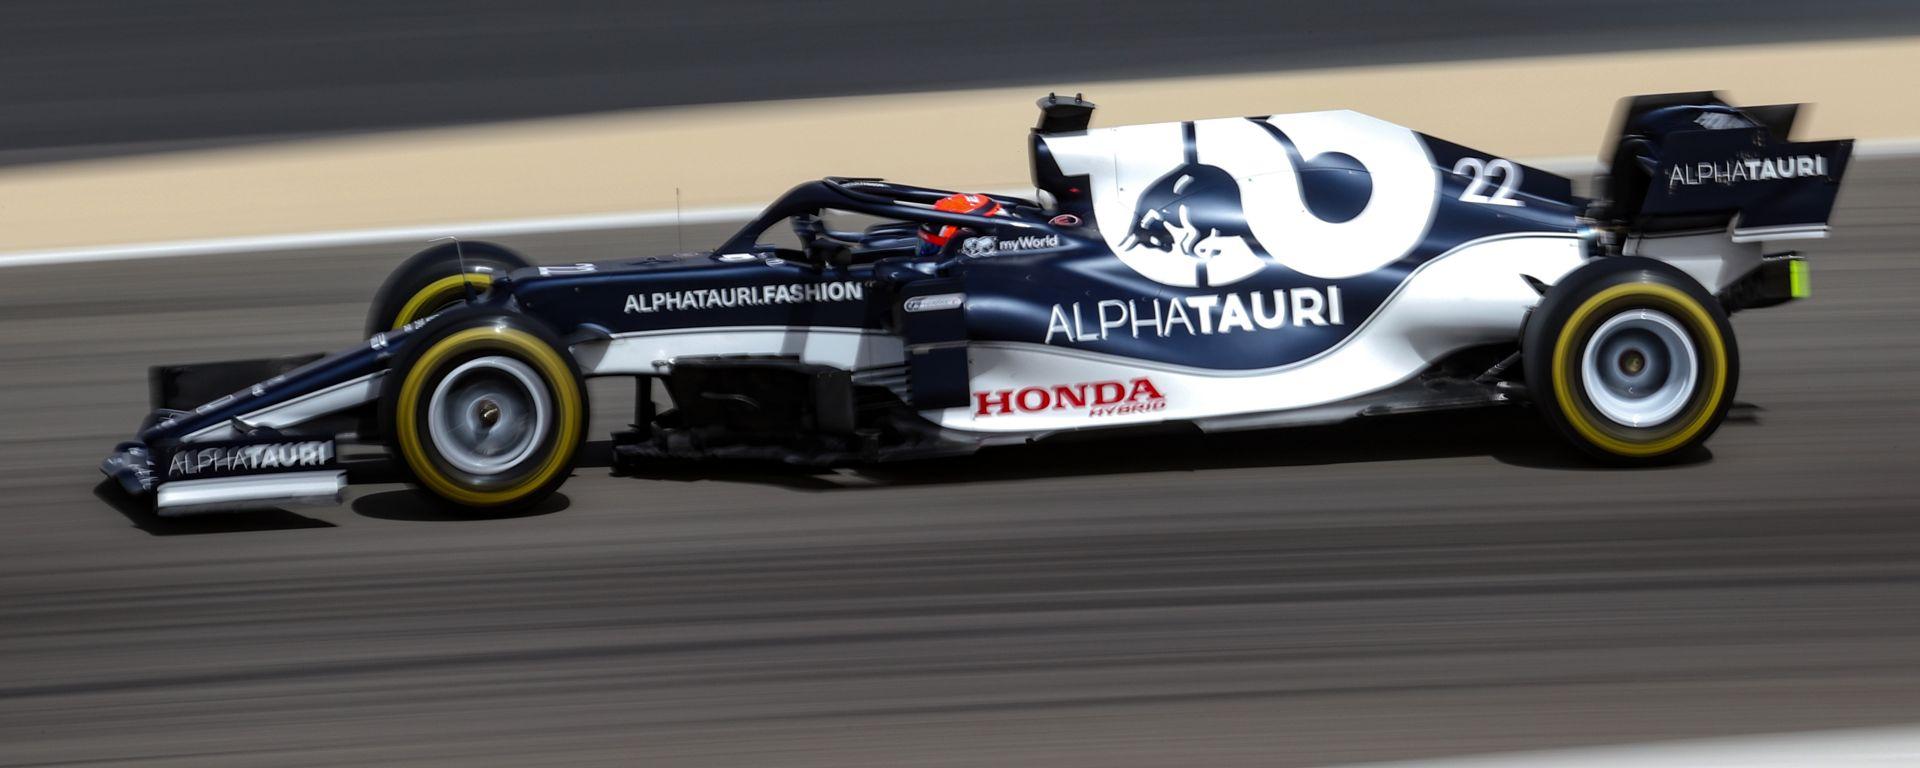 Test F1 2021: Yuki Tsunoda (AlphaTauri)